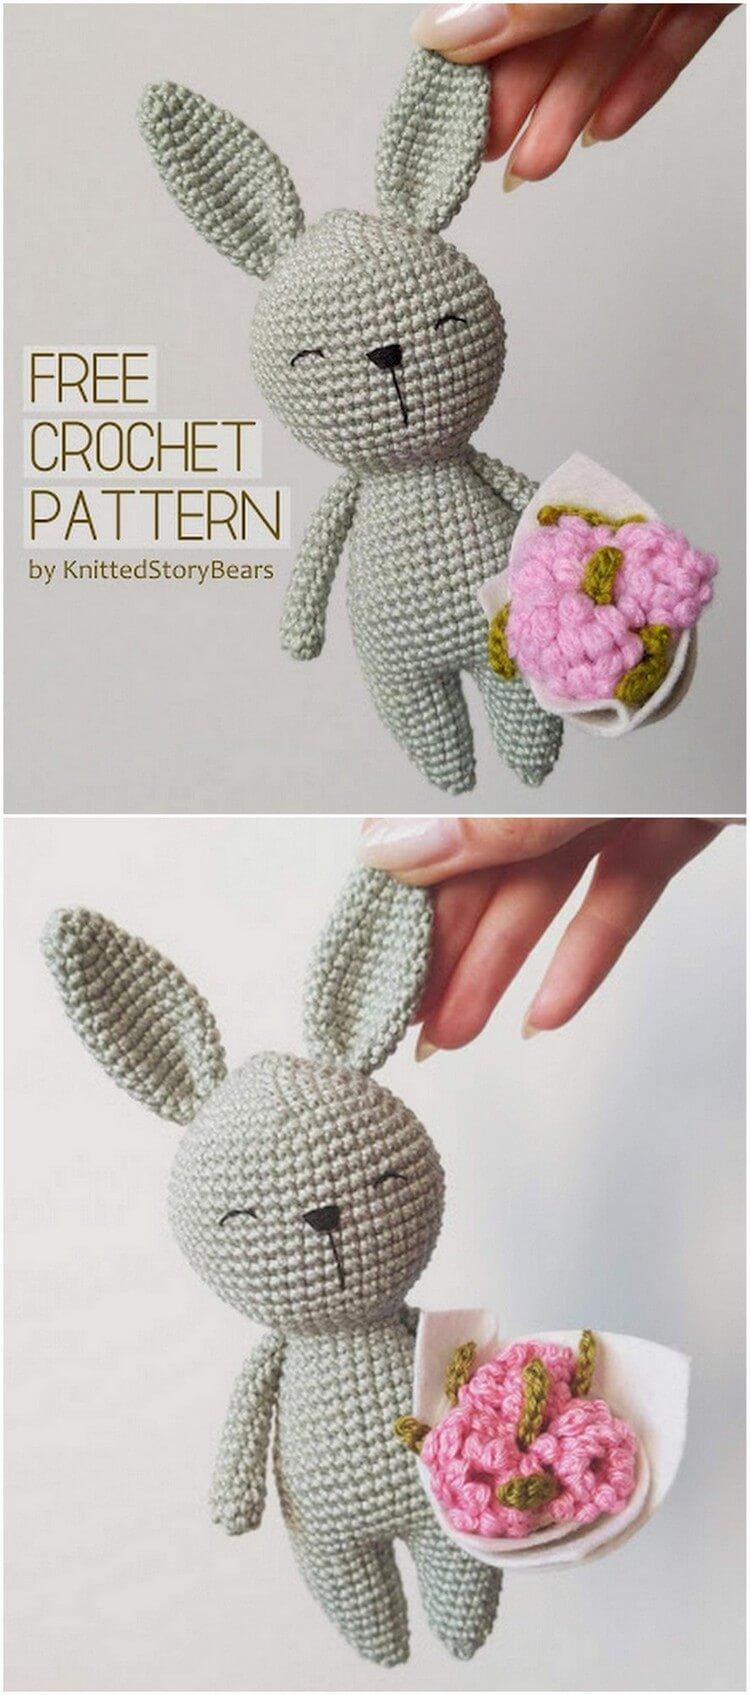 Crochet Amigurumi Pattern (12)